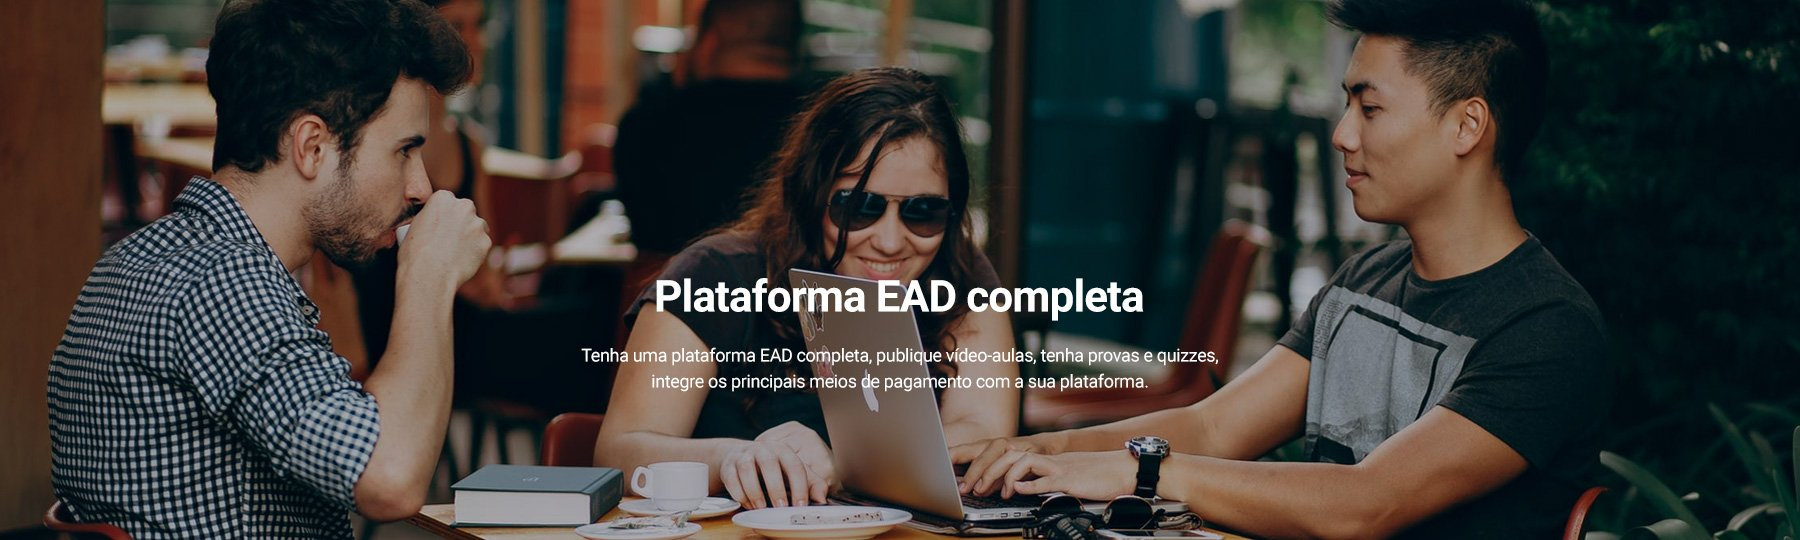 Plataforma EAD Completa